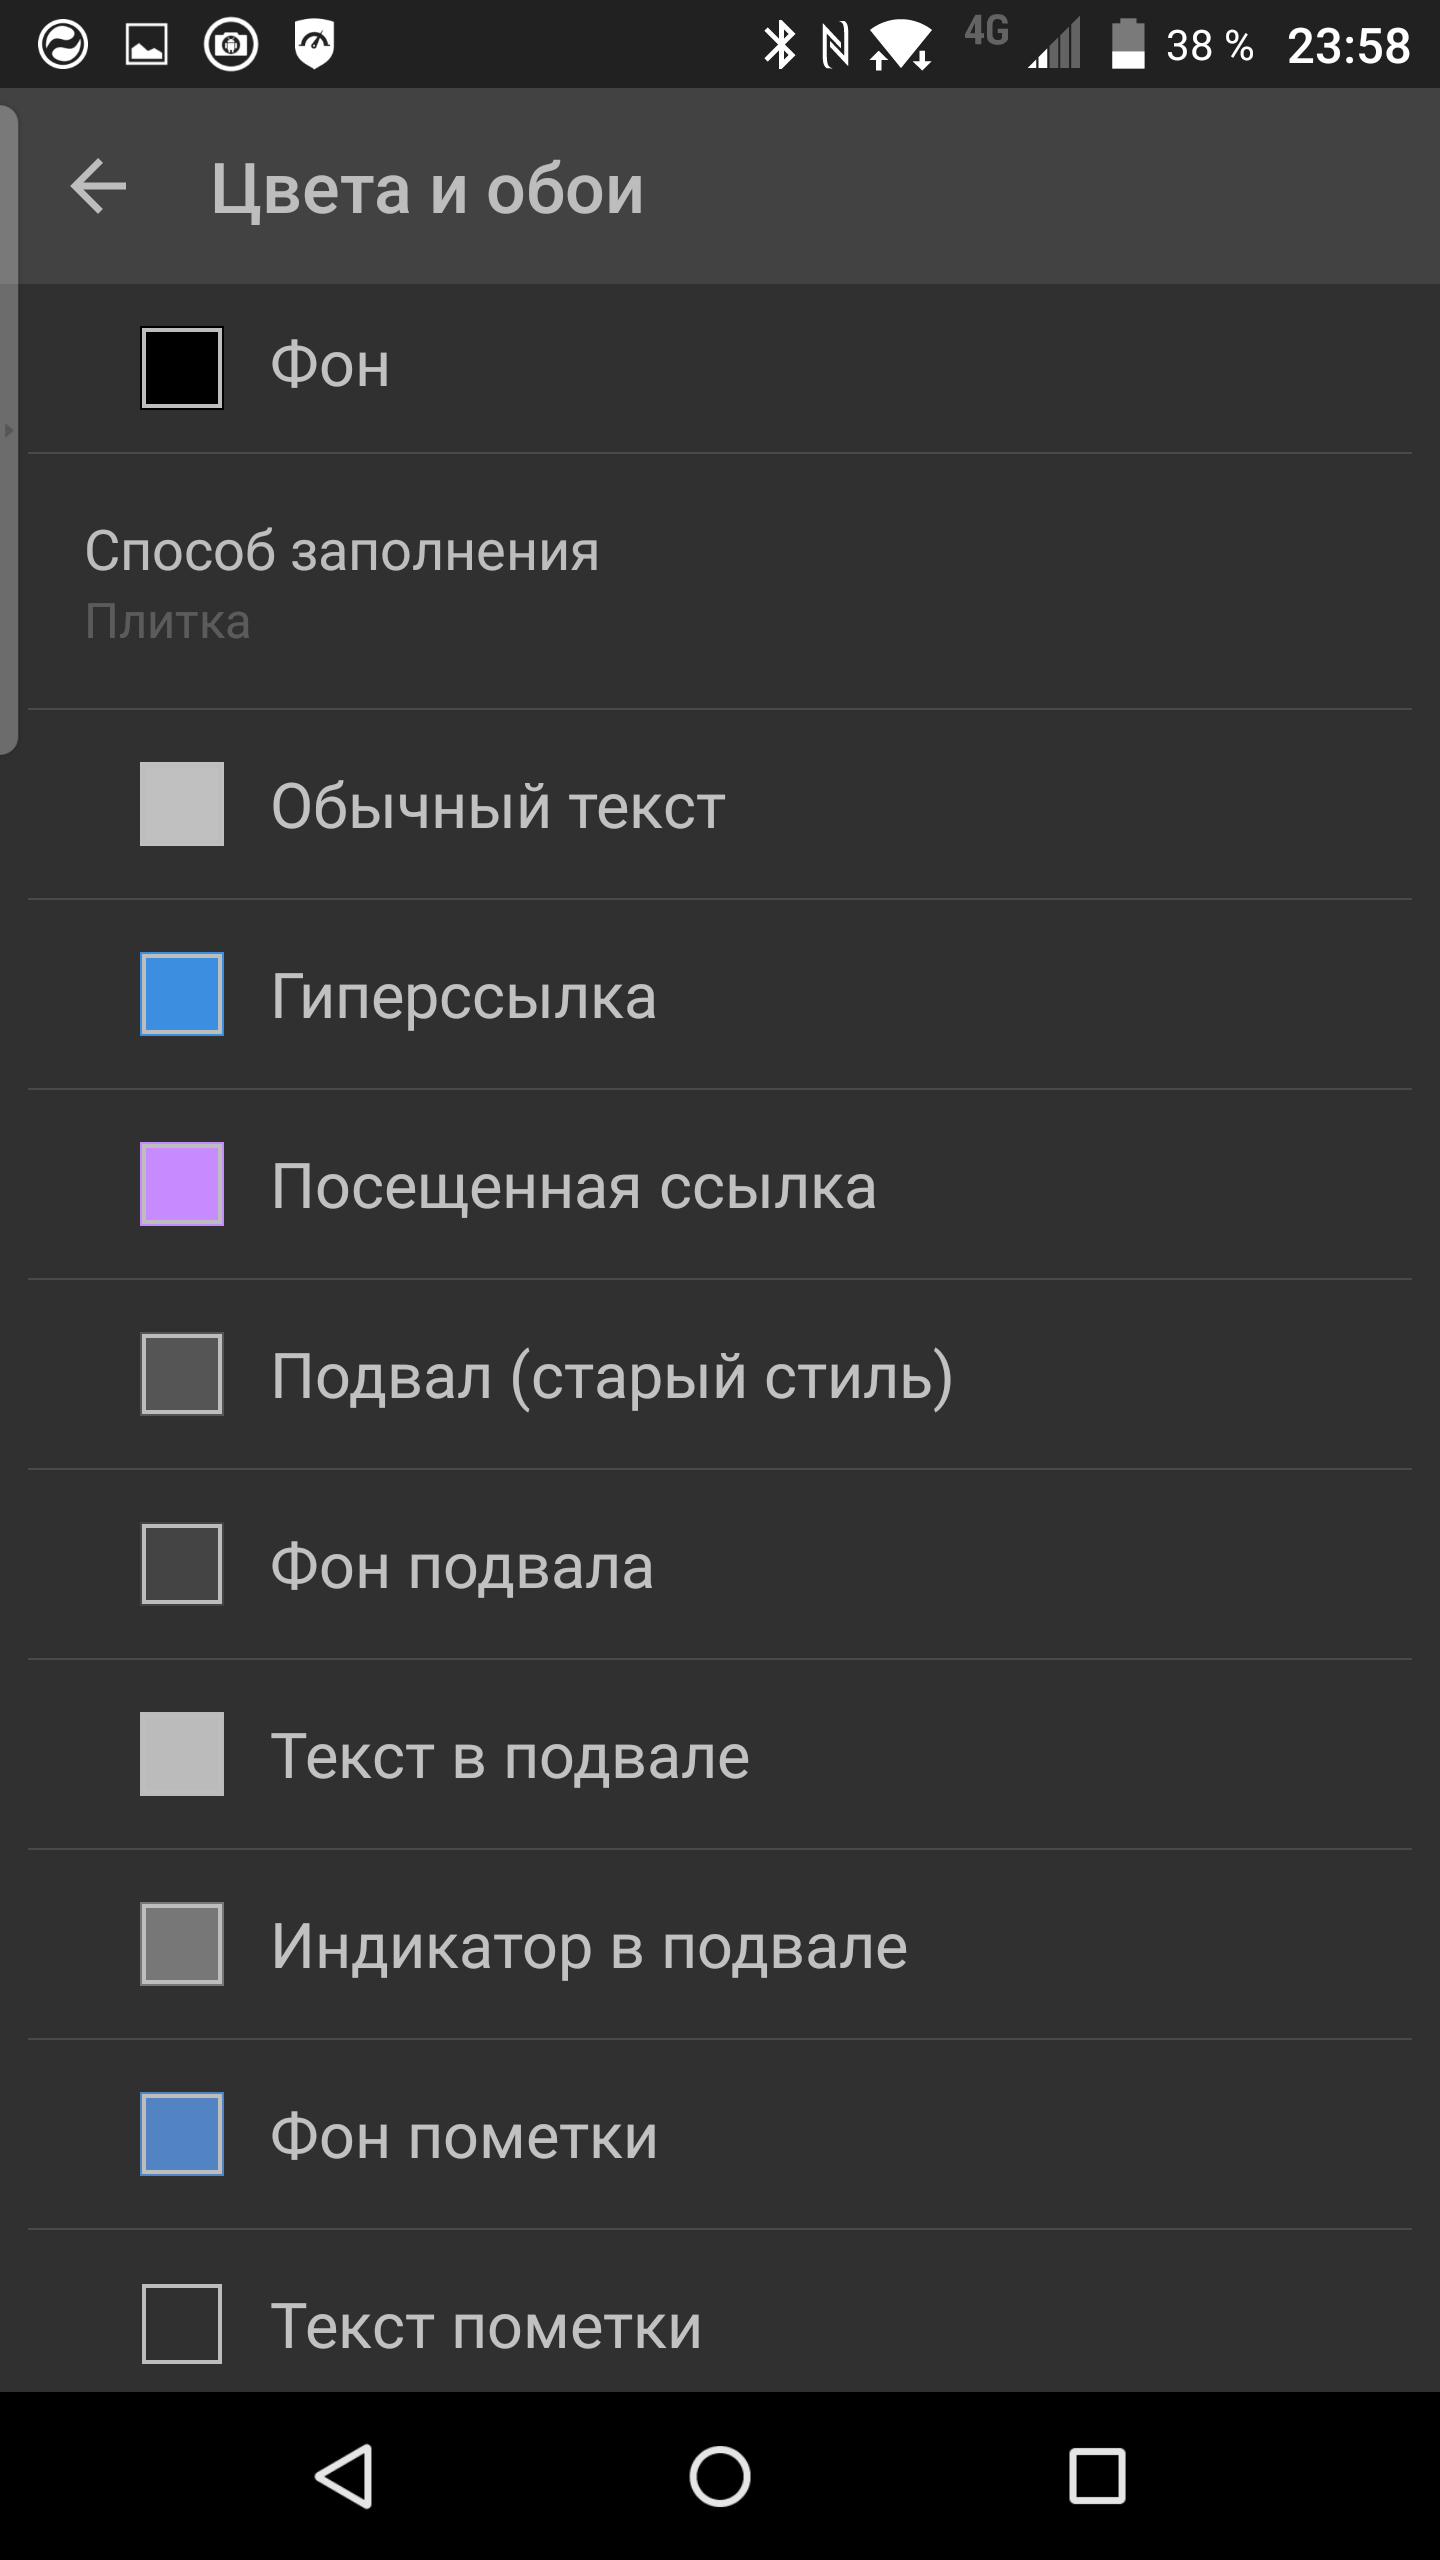 Screenshot_2016-01-23-23-59-00